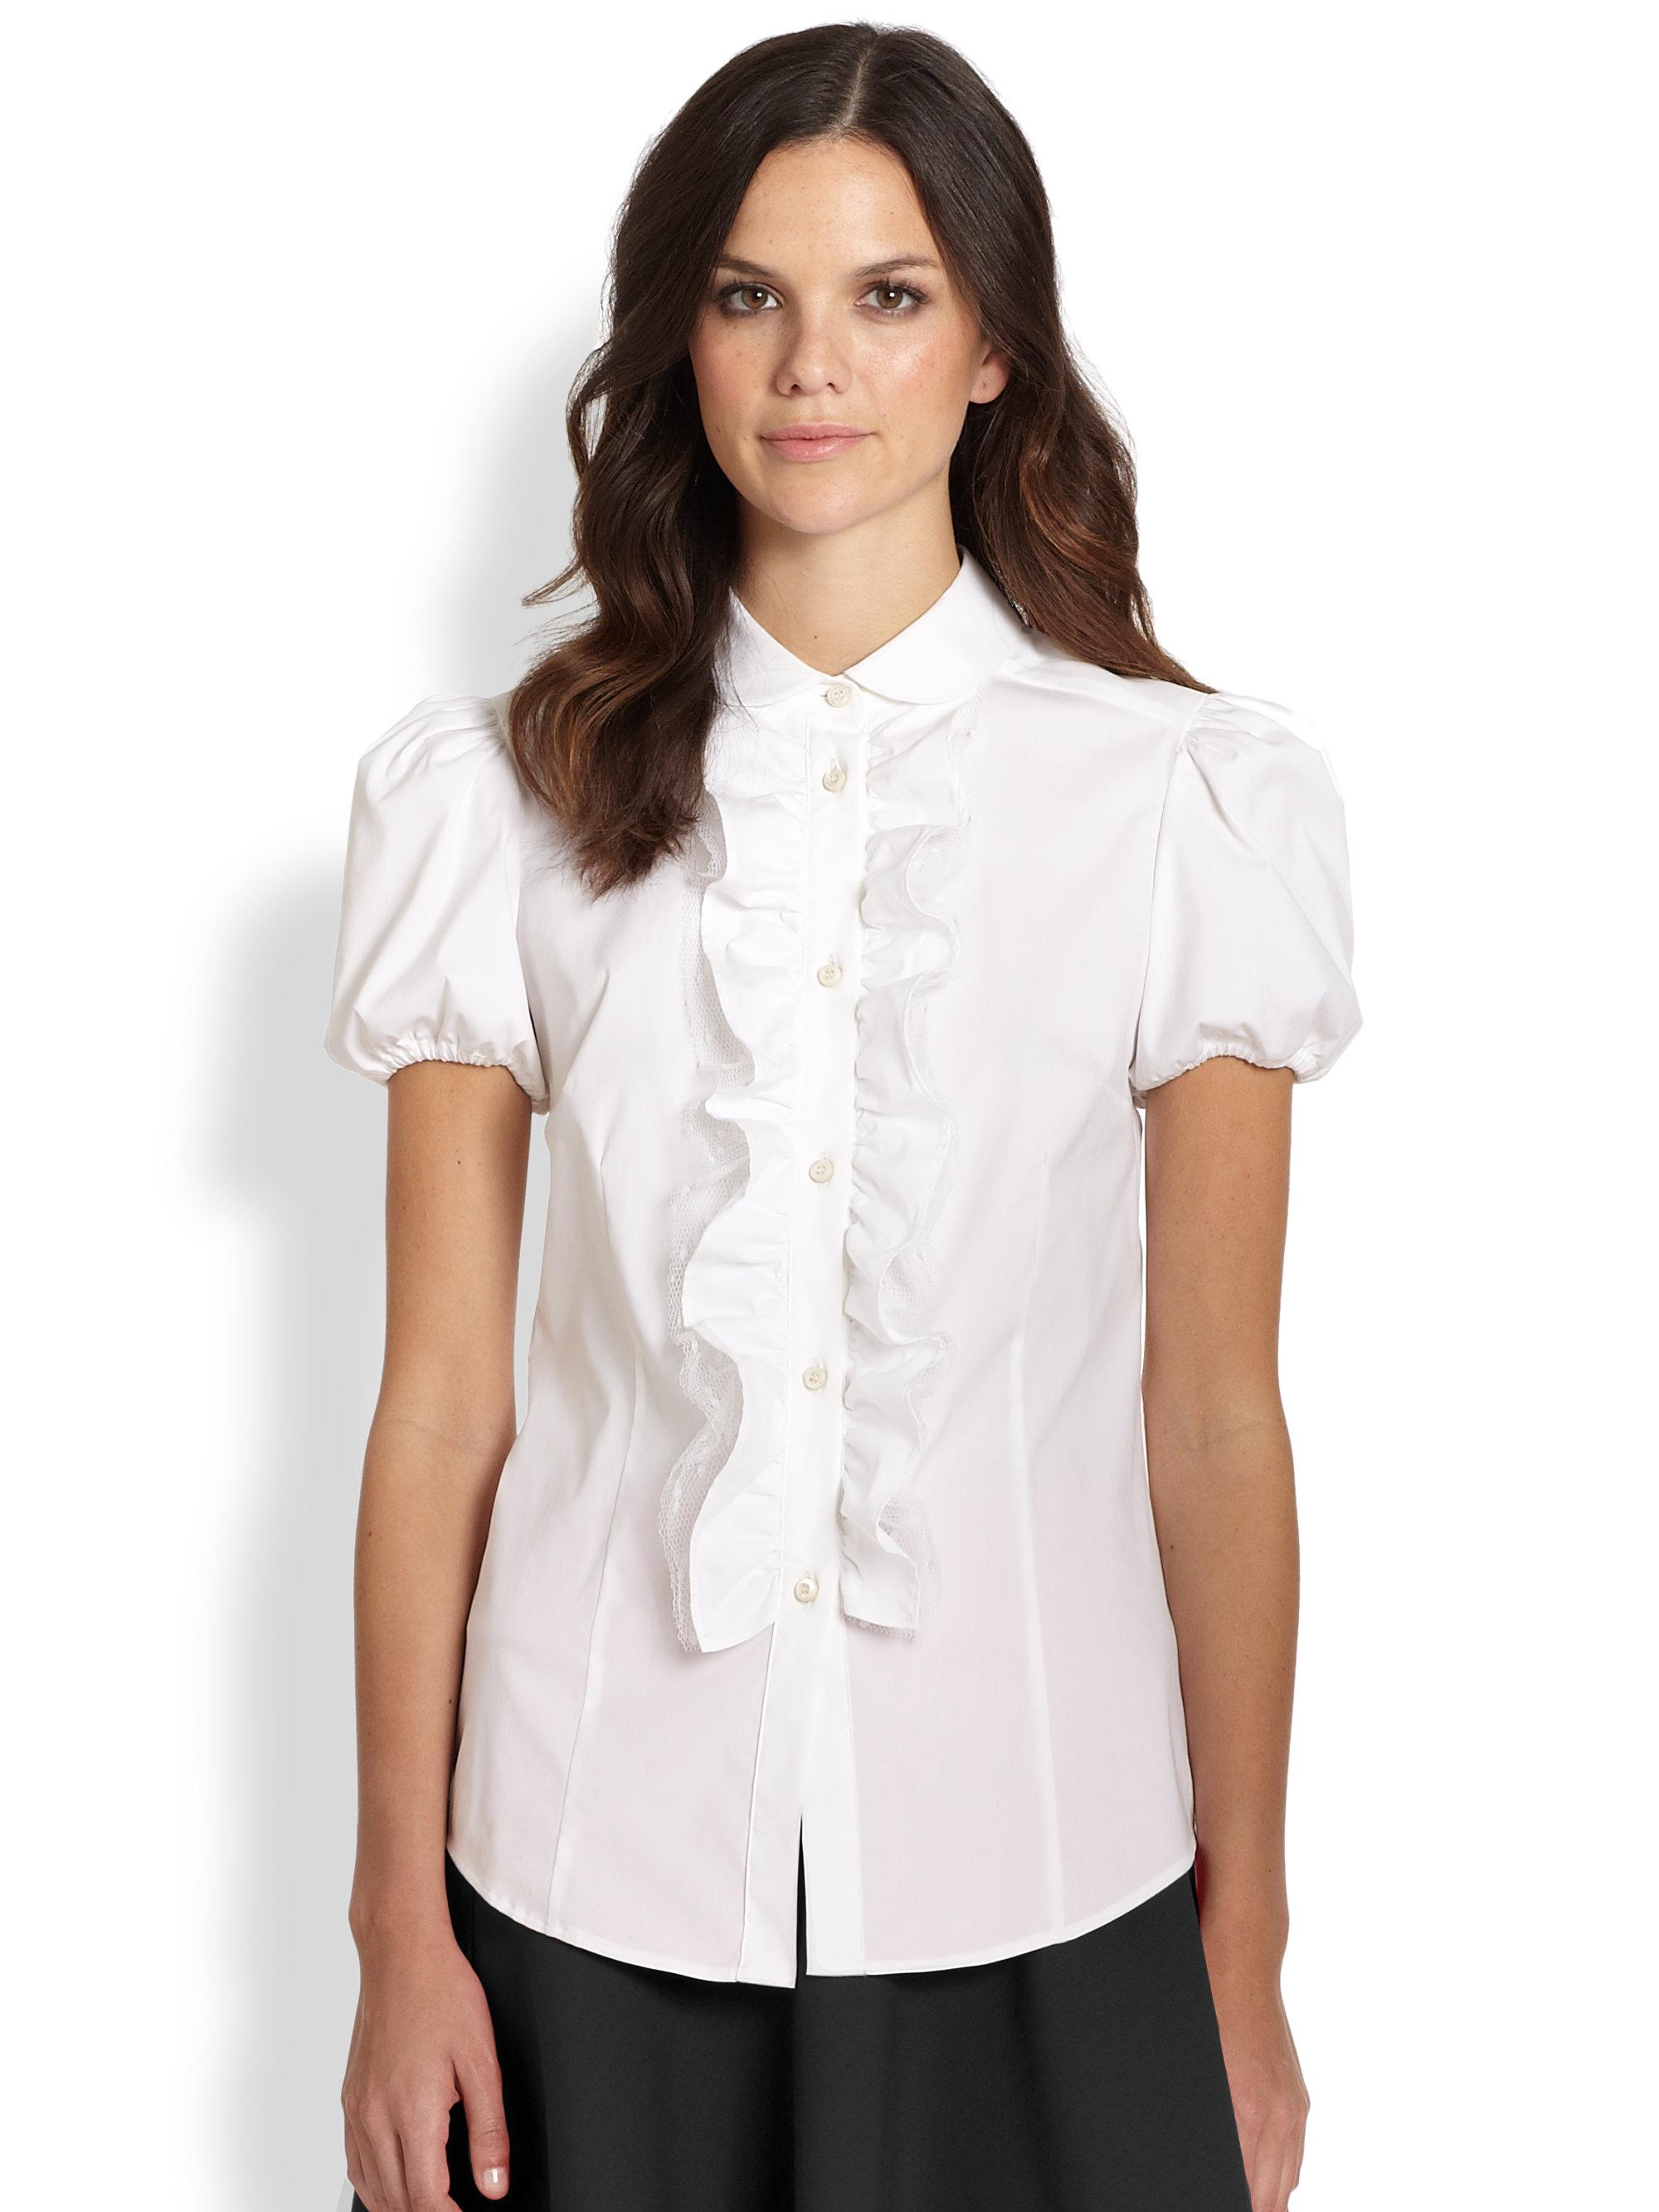 White Short Sleeve Ruffle Blouse - Peach Chevron Blouse